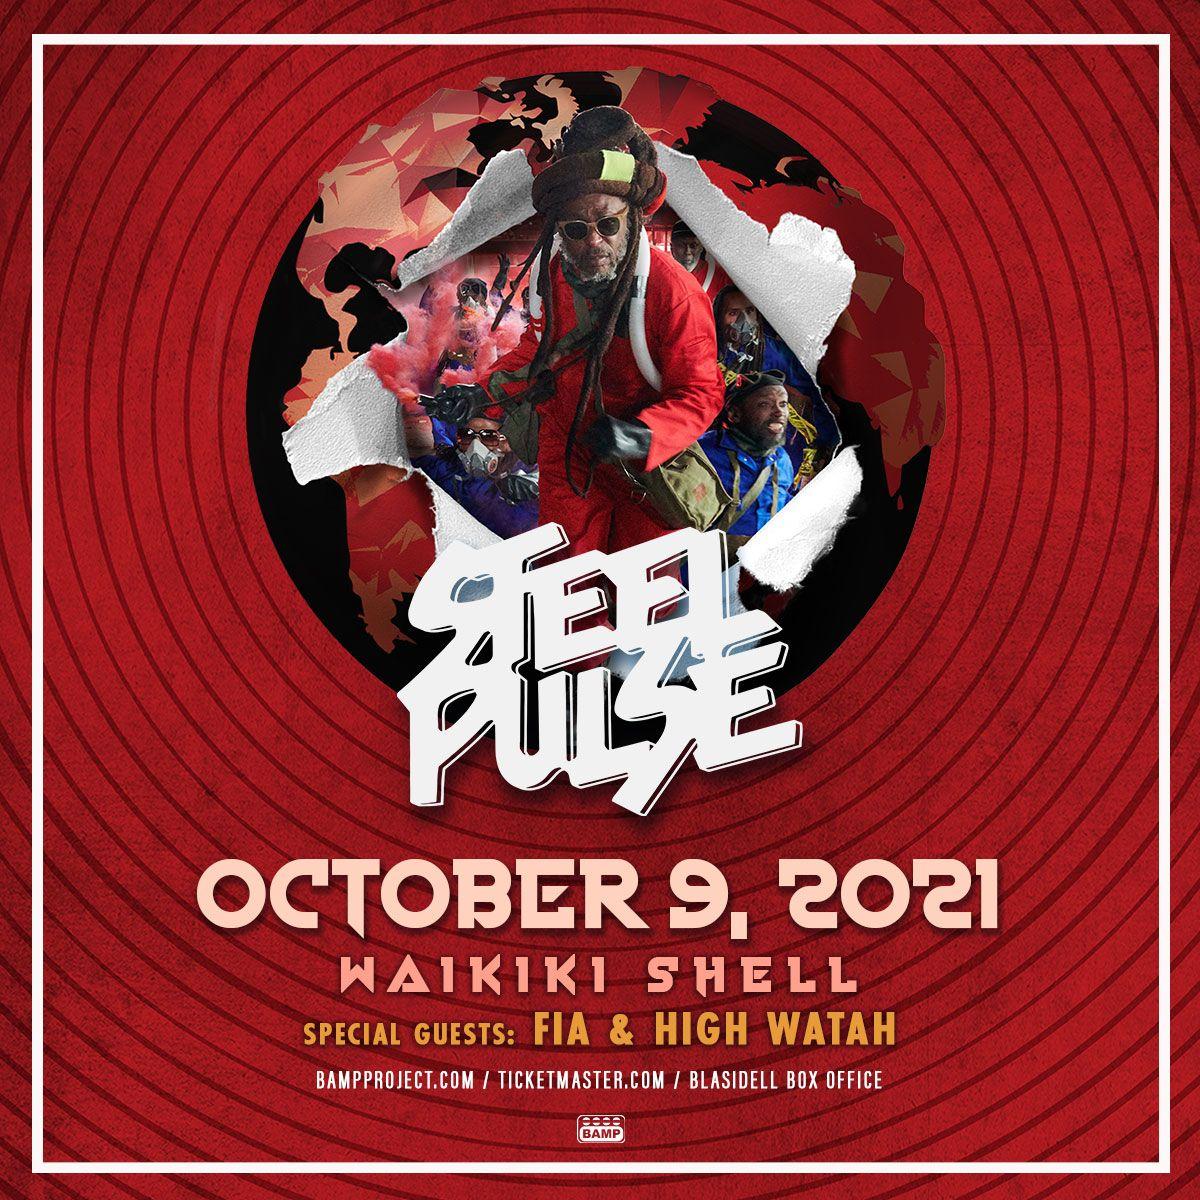 SteelPulse-Oahu_ig_1600x1600.jpg